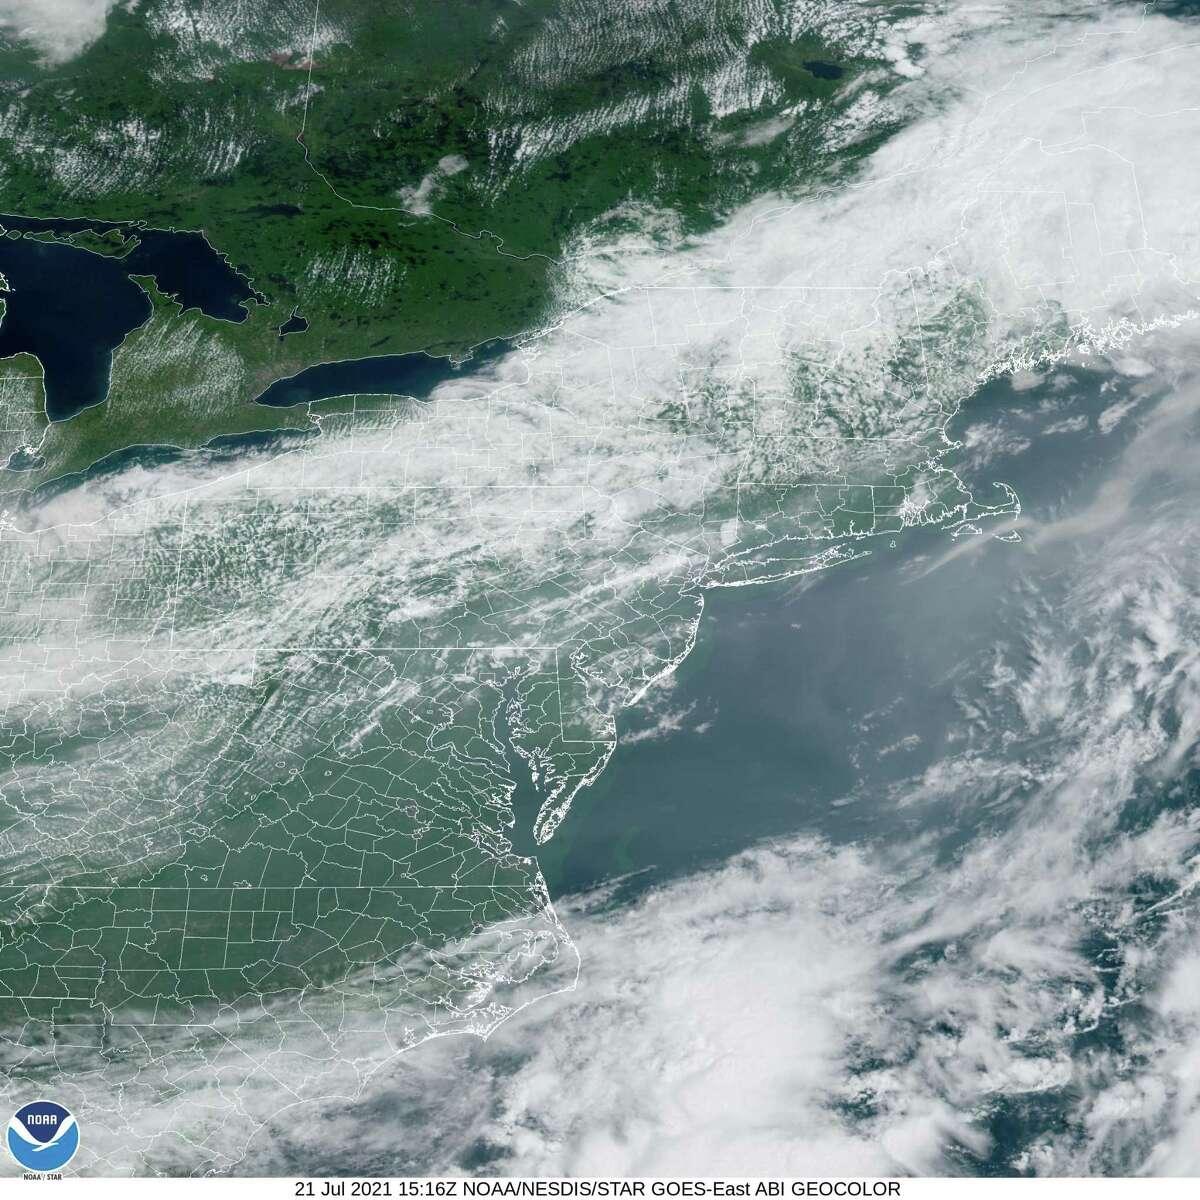 Radar image of the northeast on July 21, 2021